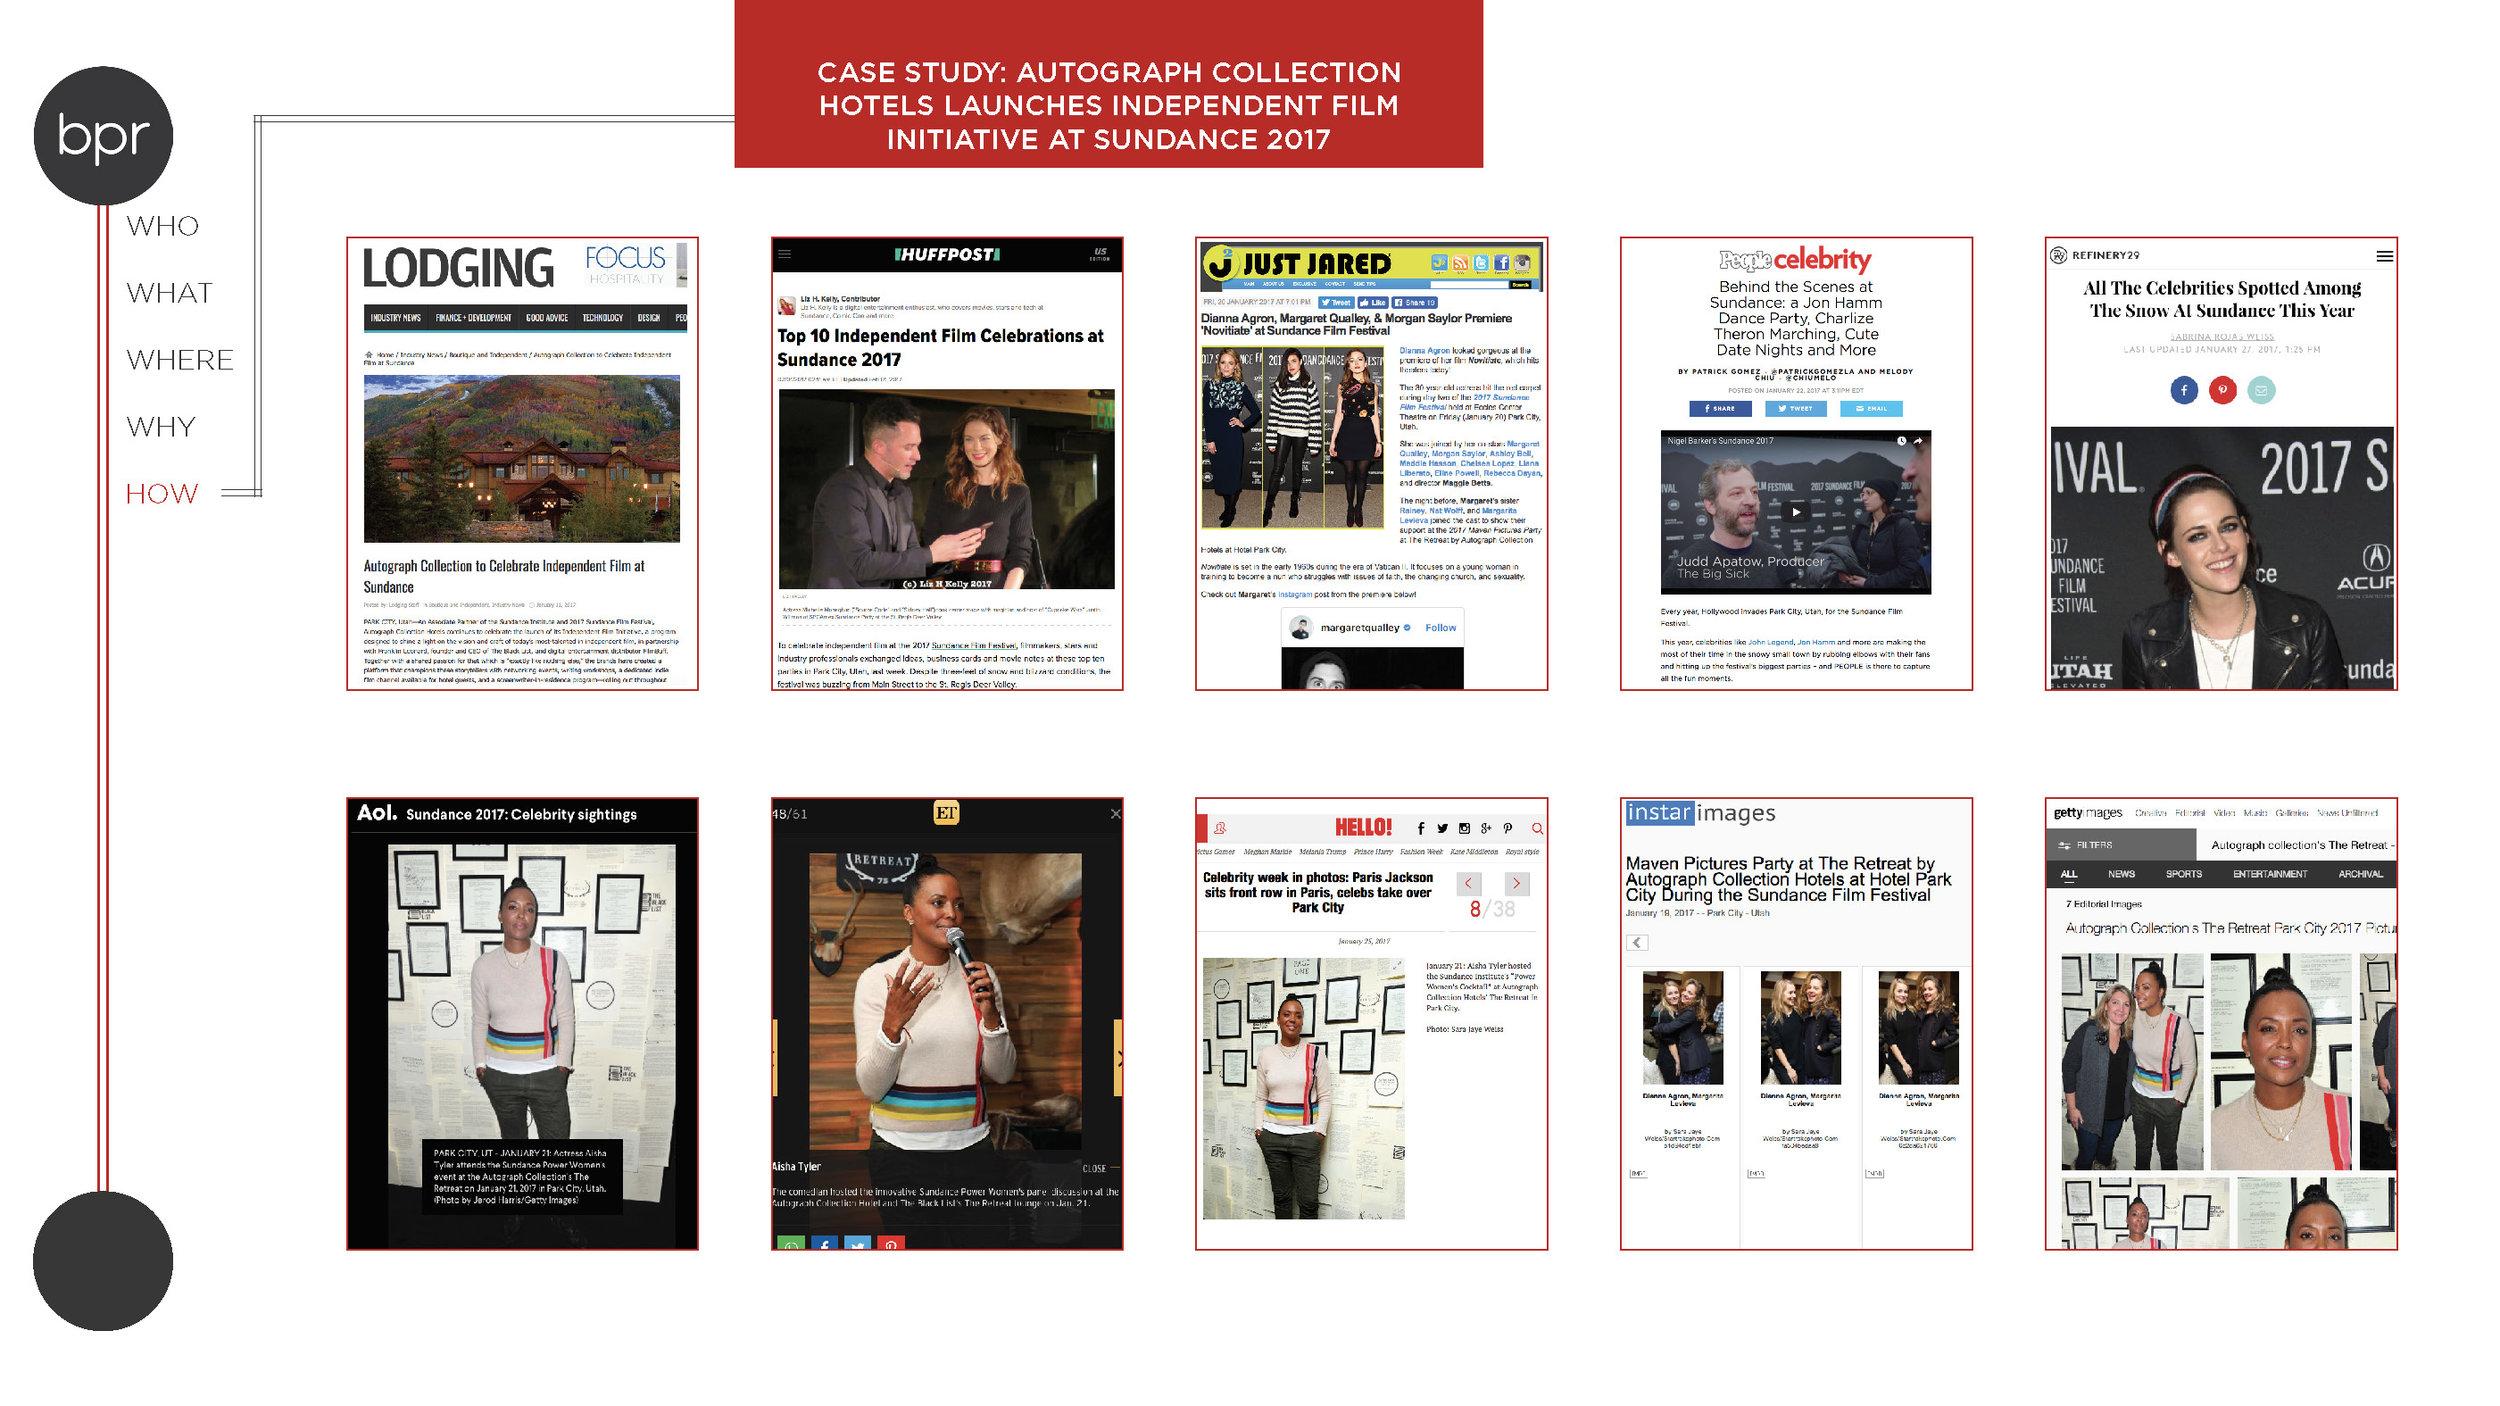 Autograph Sundance Case Study_Page_4.jpg